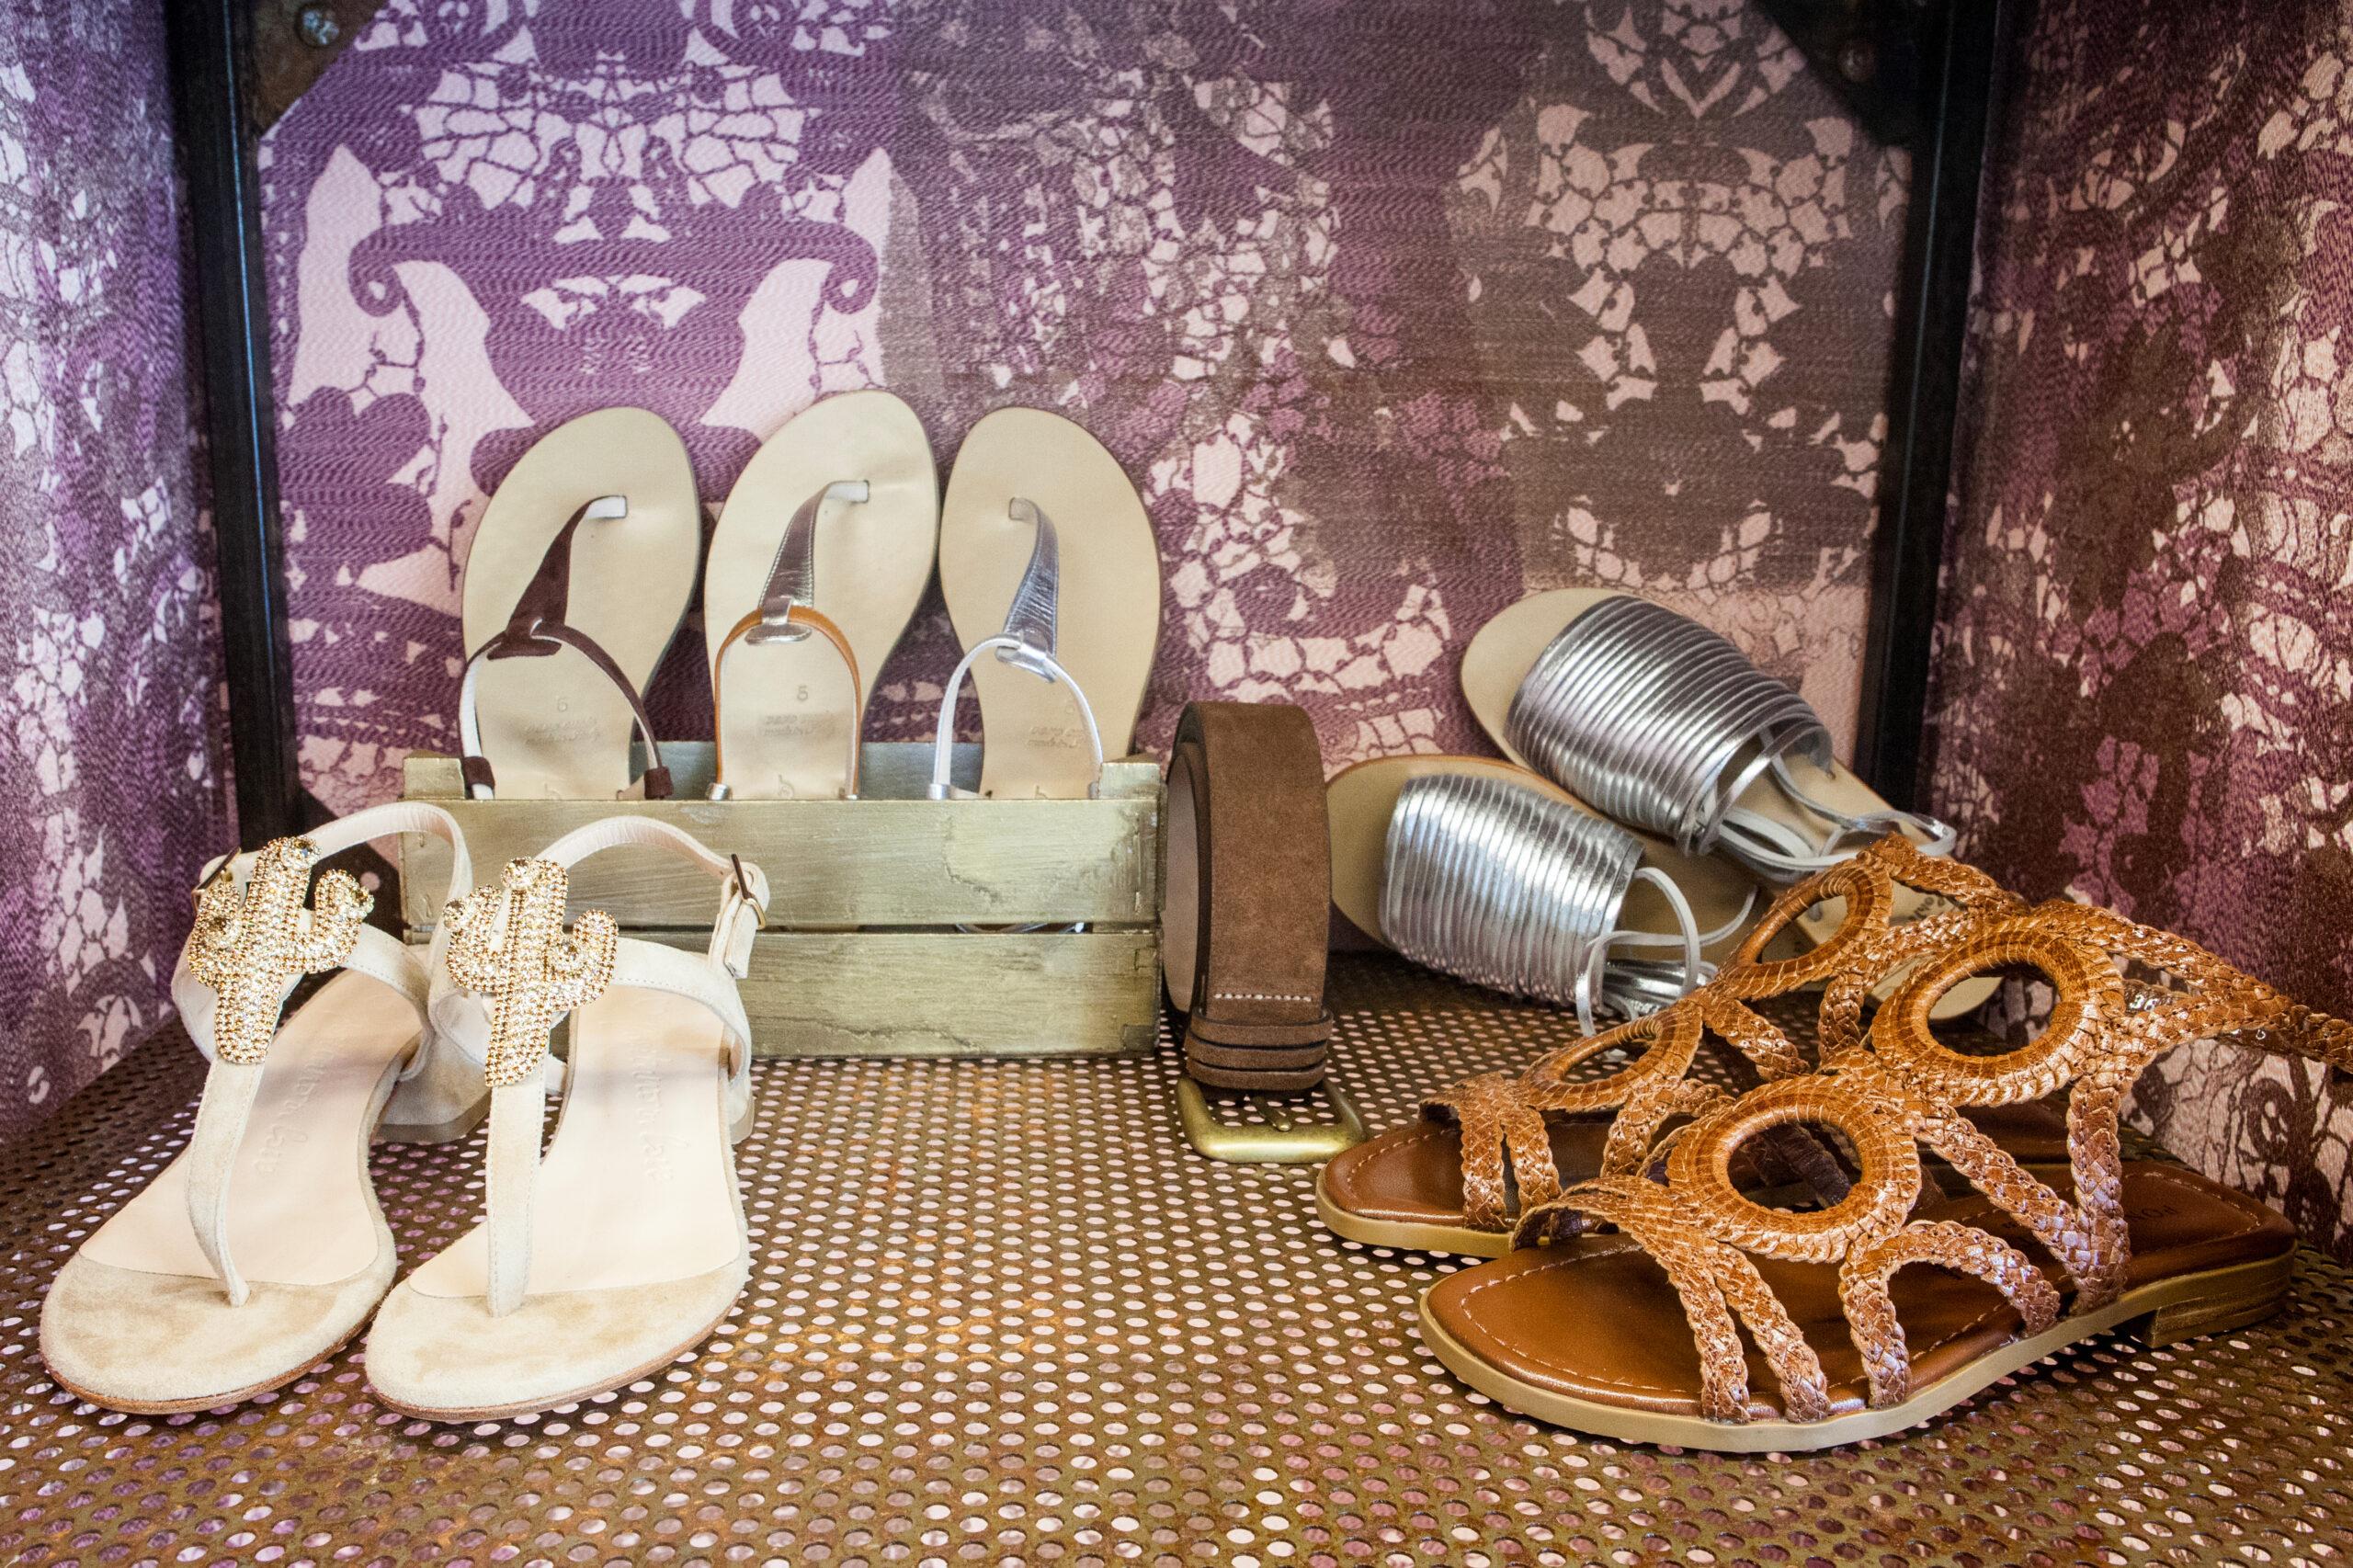 Collezione P/E Mucca Carolina Genova calzature donna